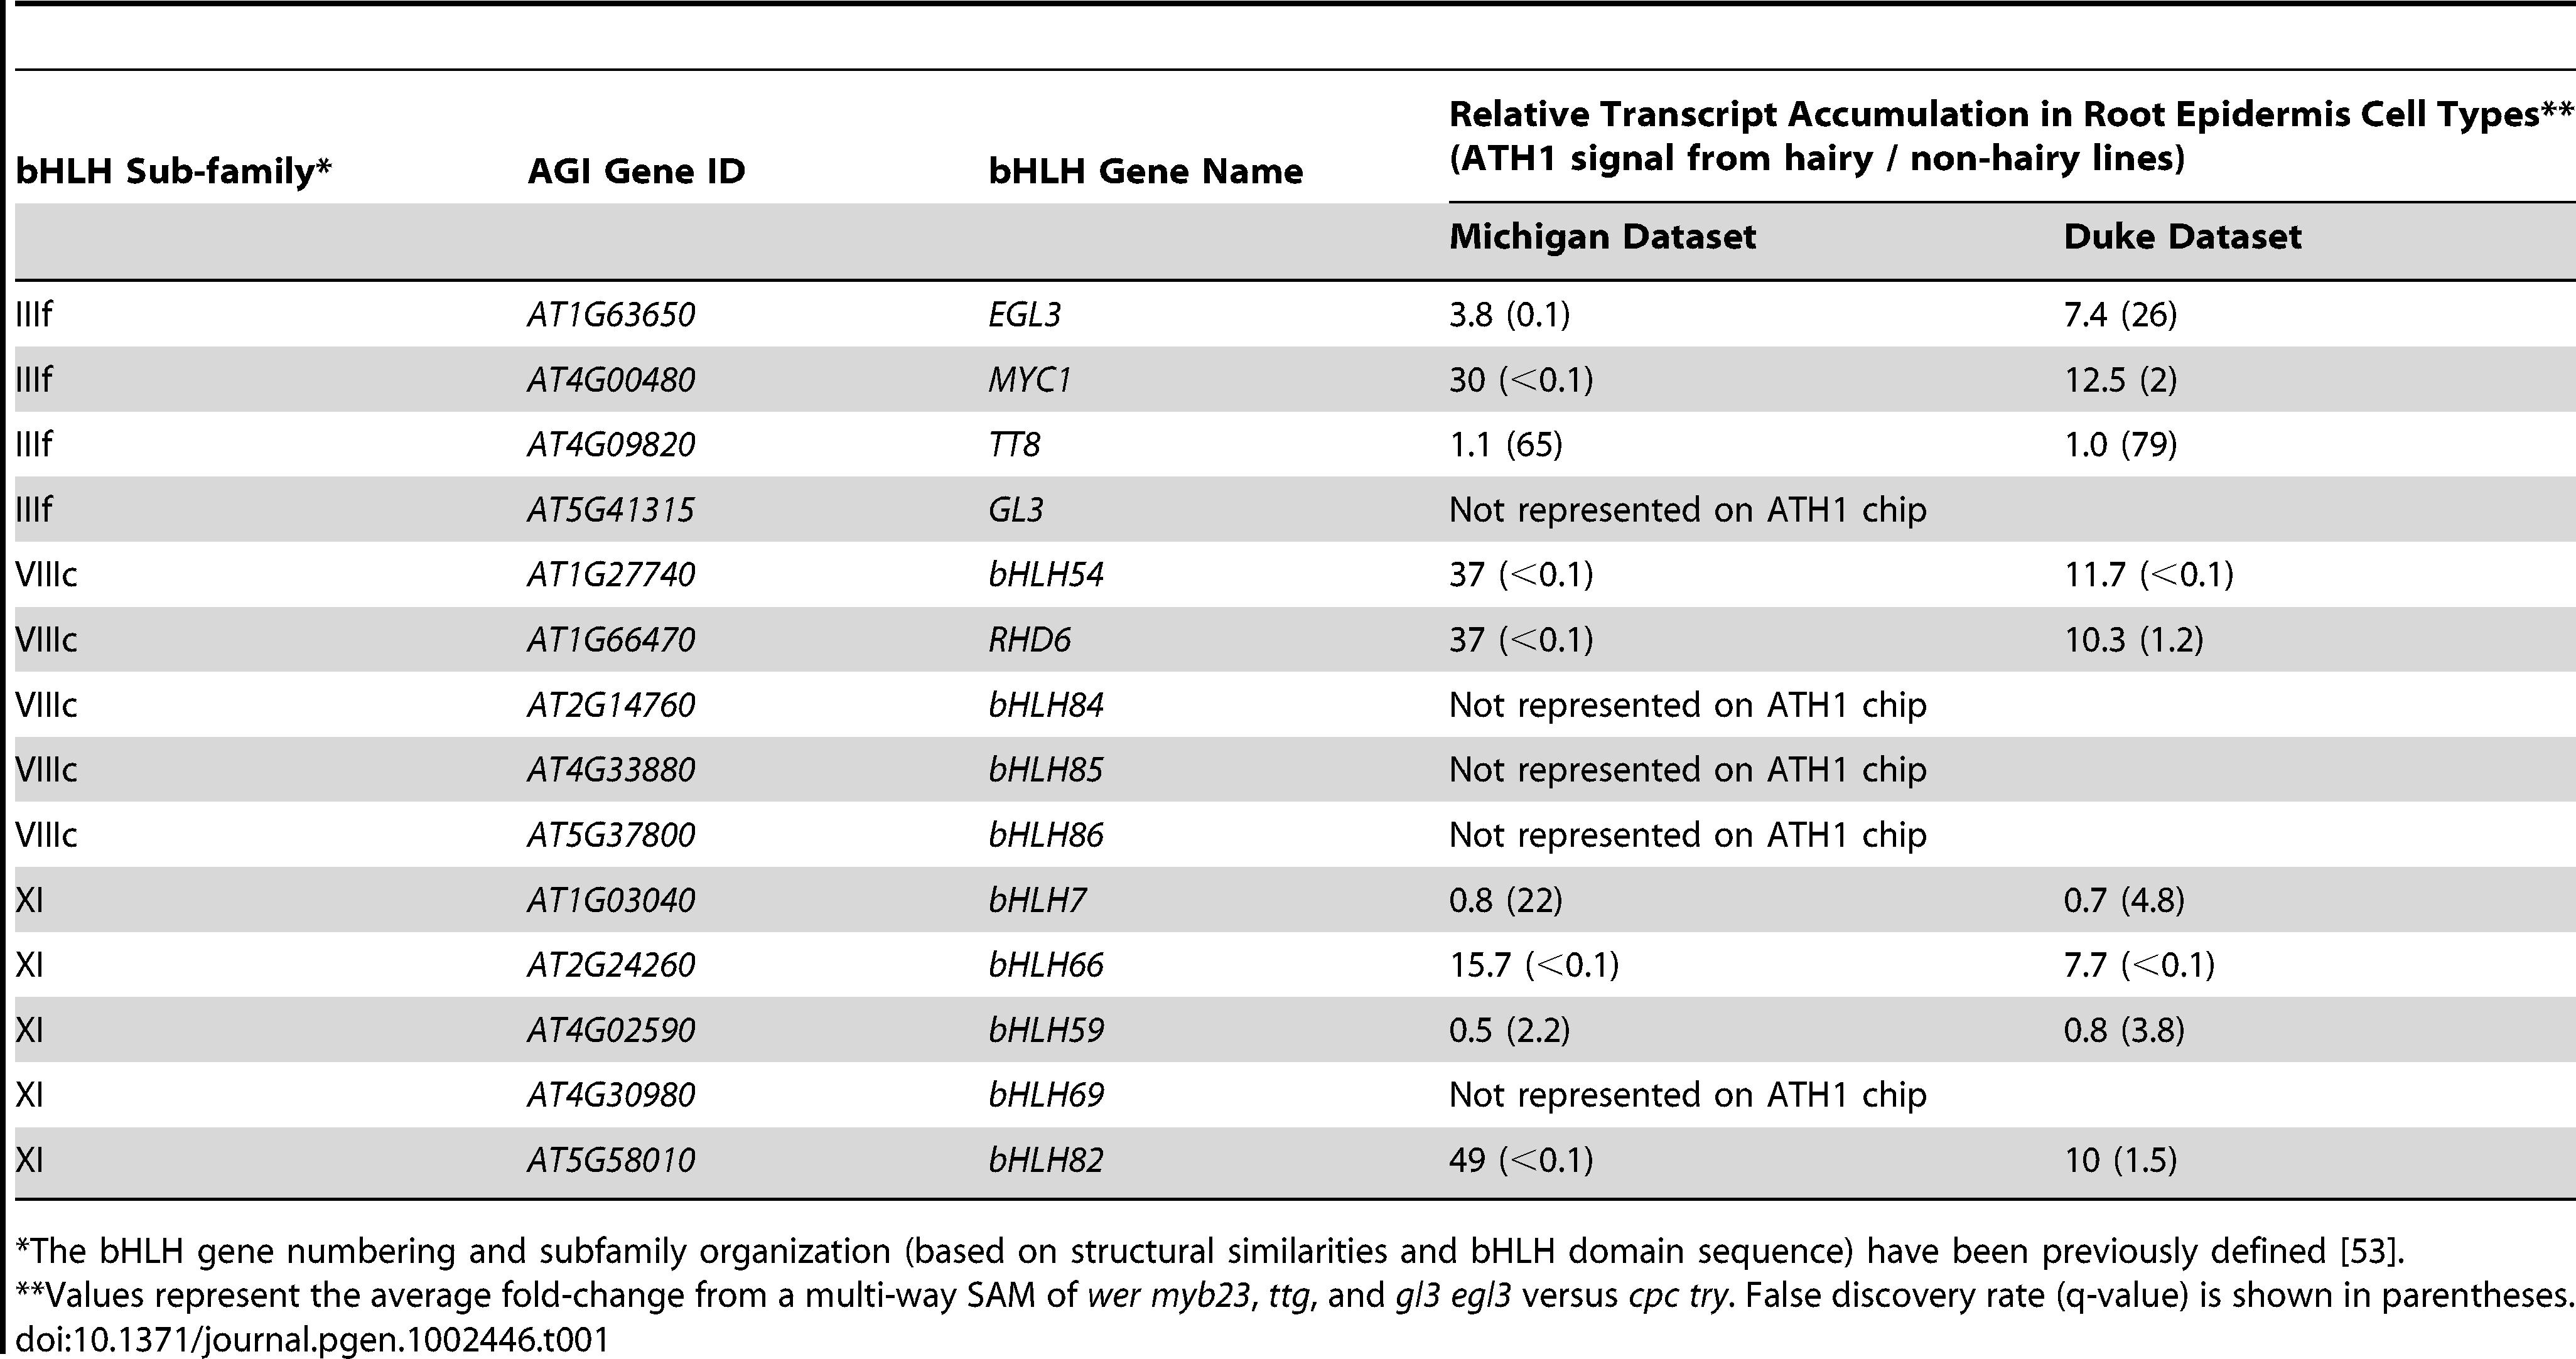 Three subfamilies of bHLH genes in Arabidopsis involved in root epidermis development.